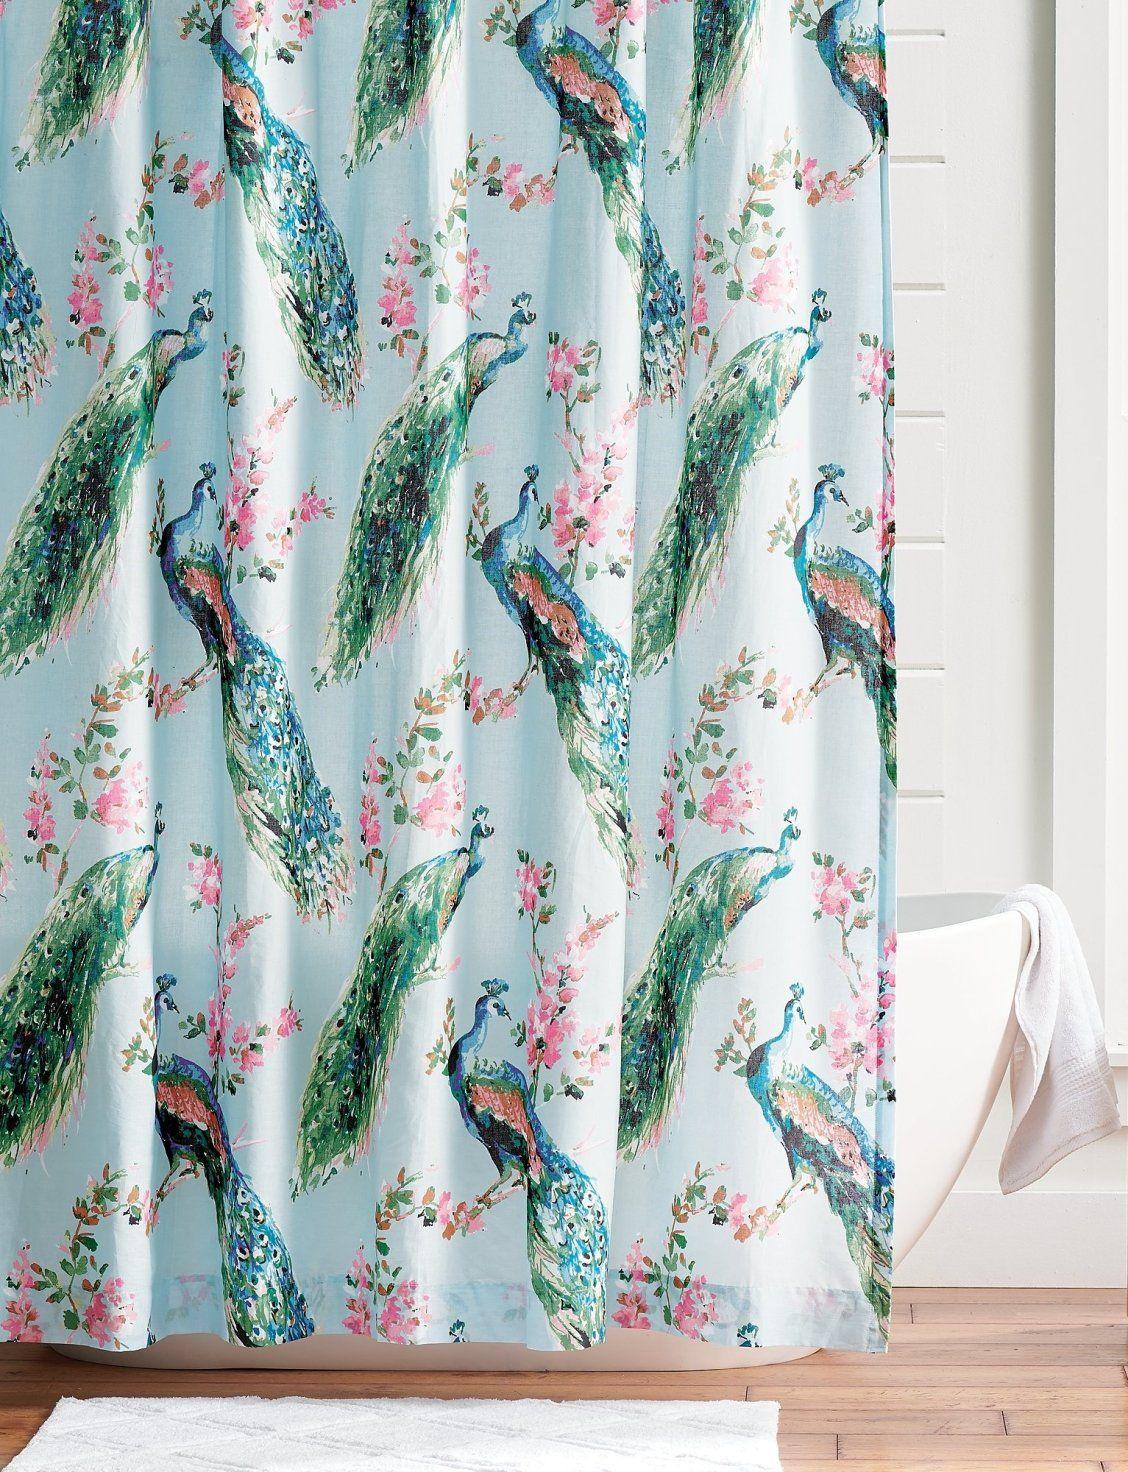 Giada Peacock Shower Curtain In 2020 Peacock Shower Curtain